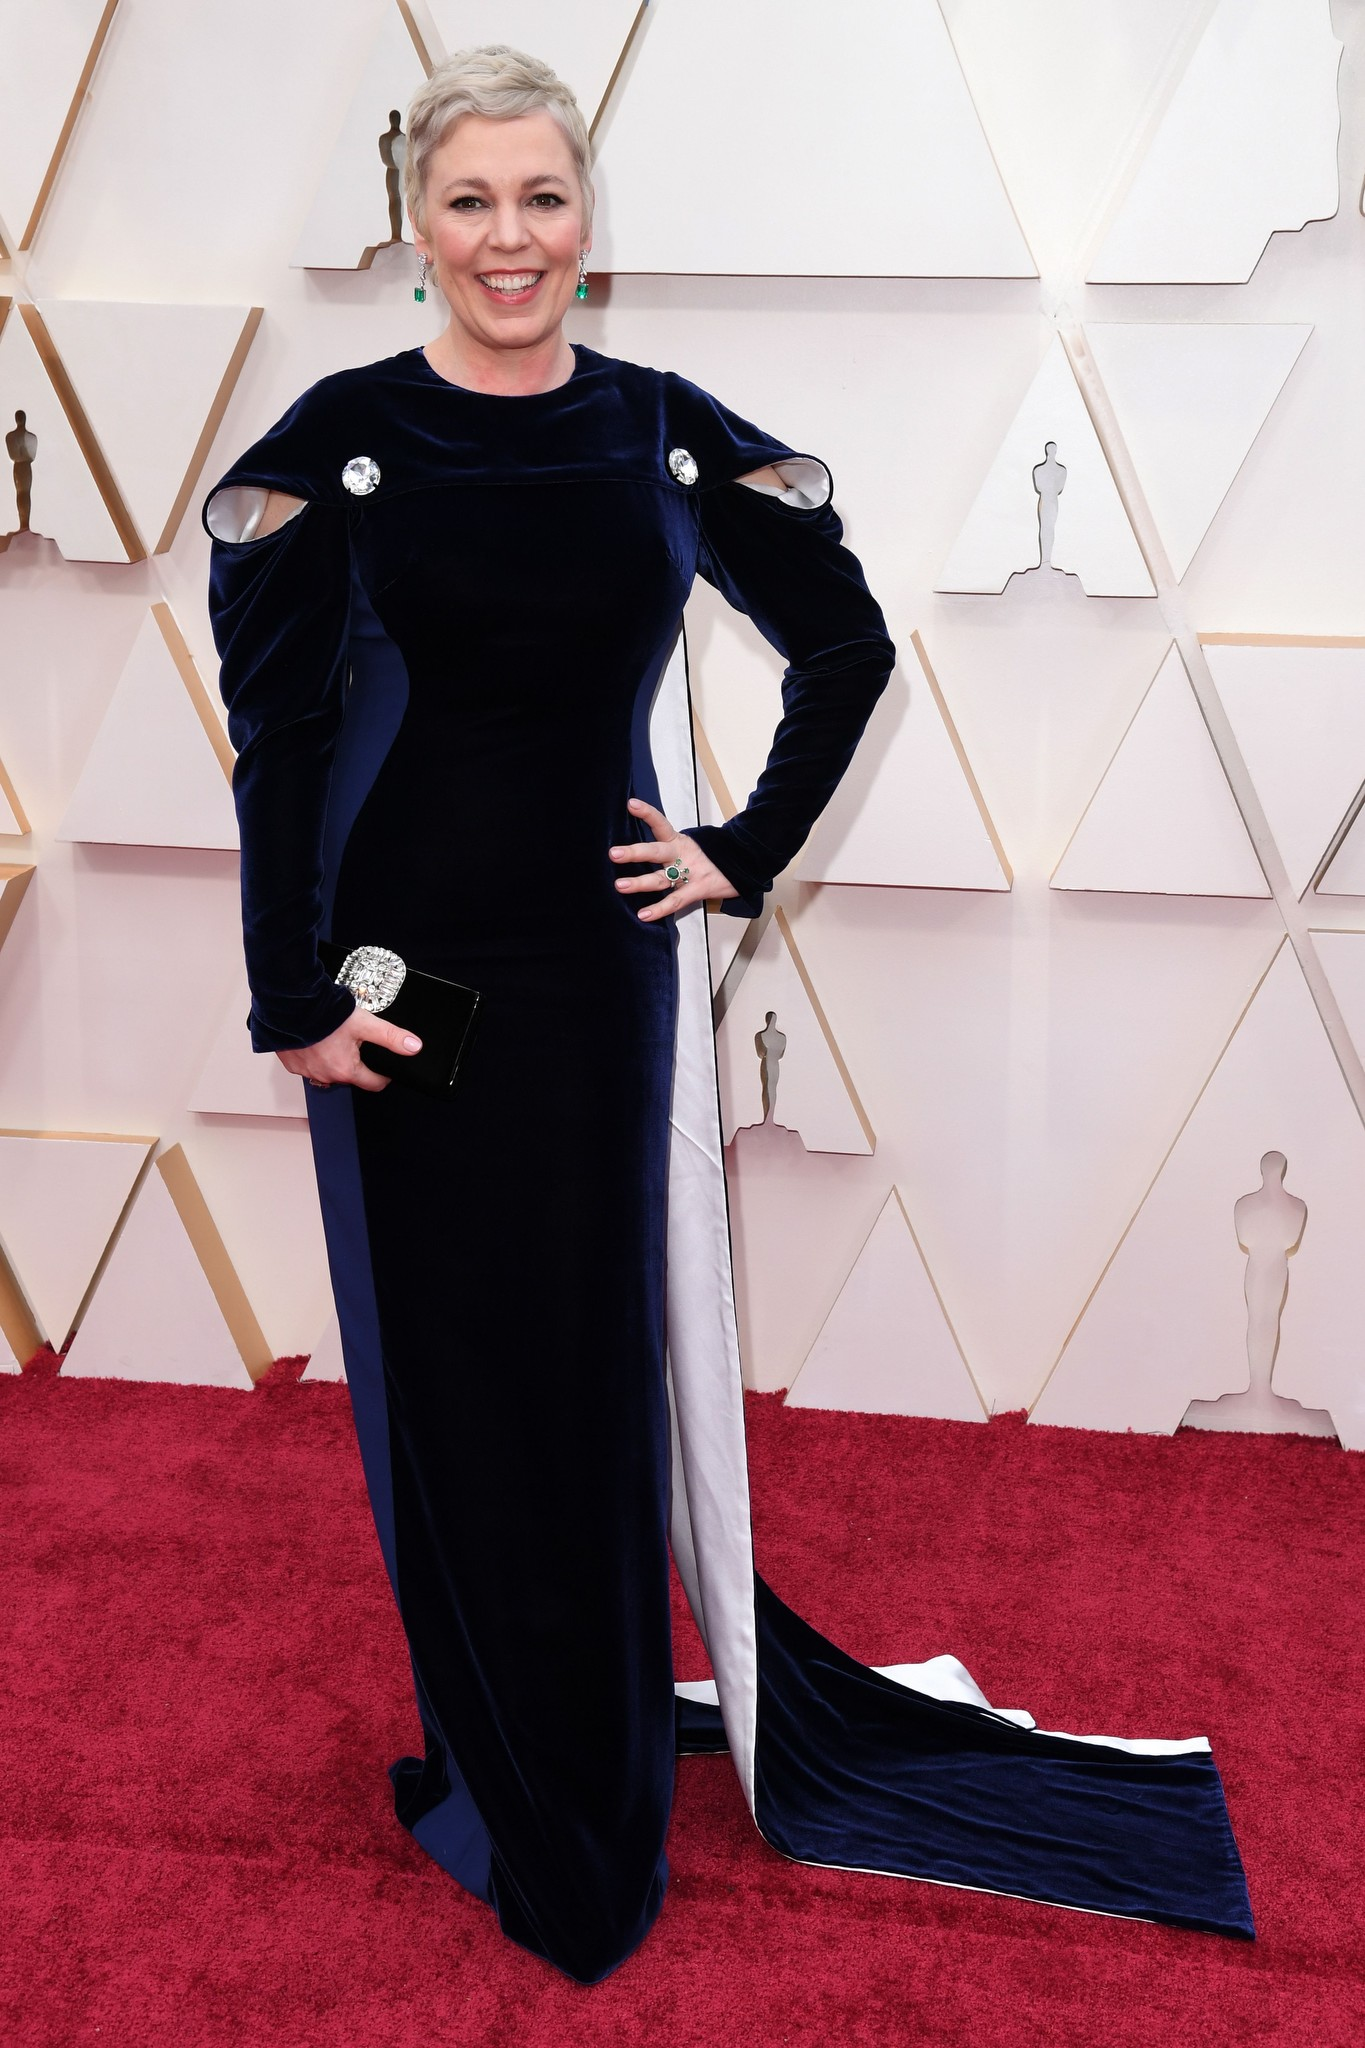 Olivia Colman at the 2020 Oscars.